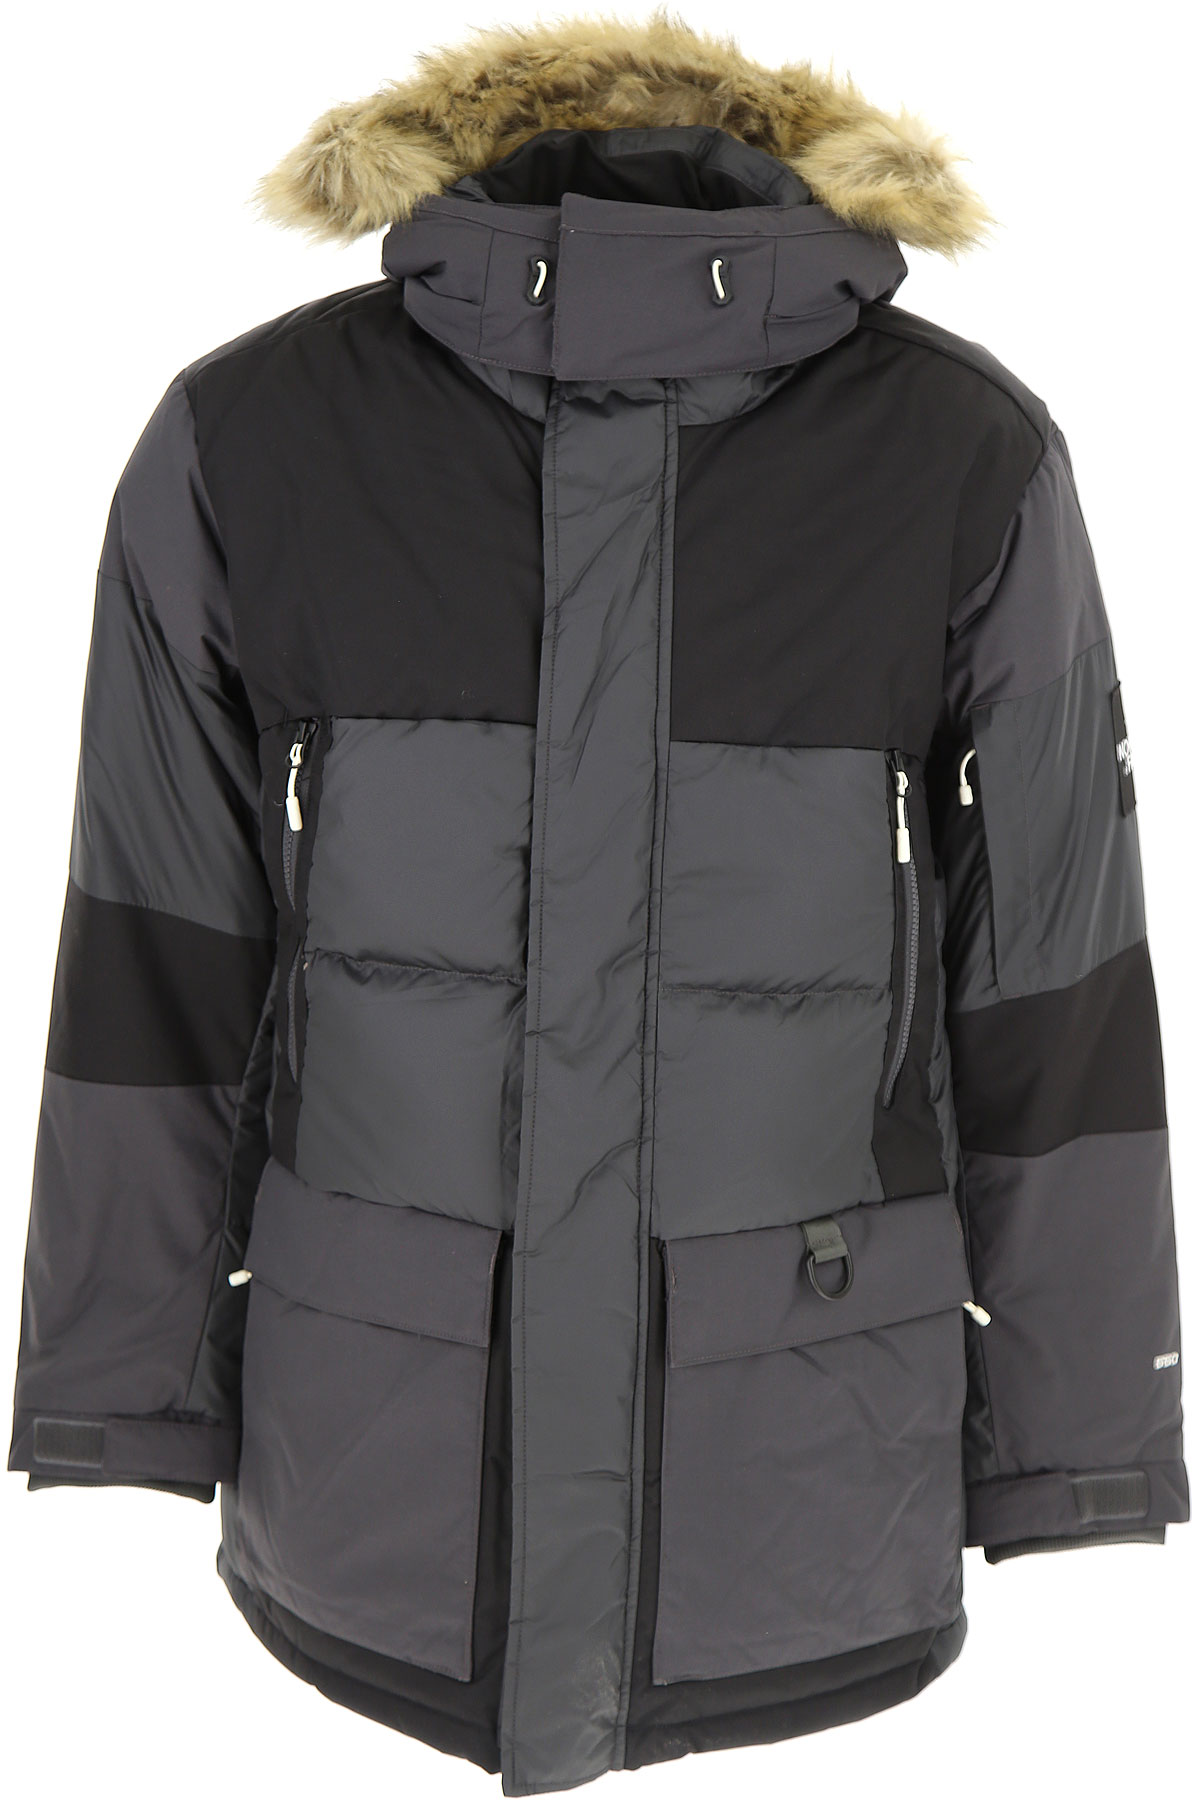 Image of The North Face Down Jacket for Men, Puffer Ski Jacket, Asphalt Grey, polyester, 2017, L M S XL